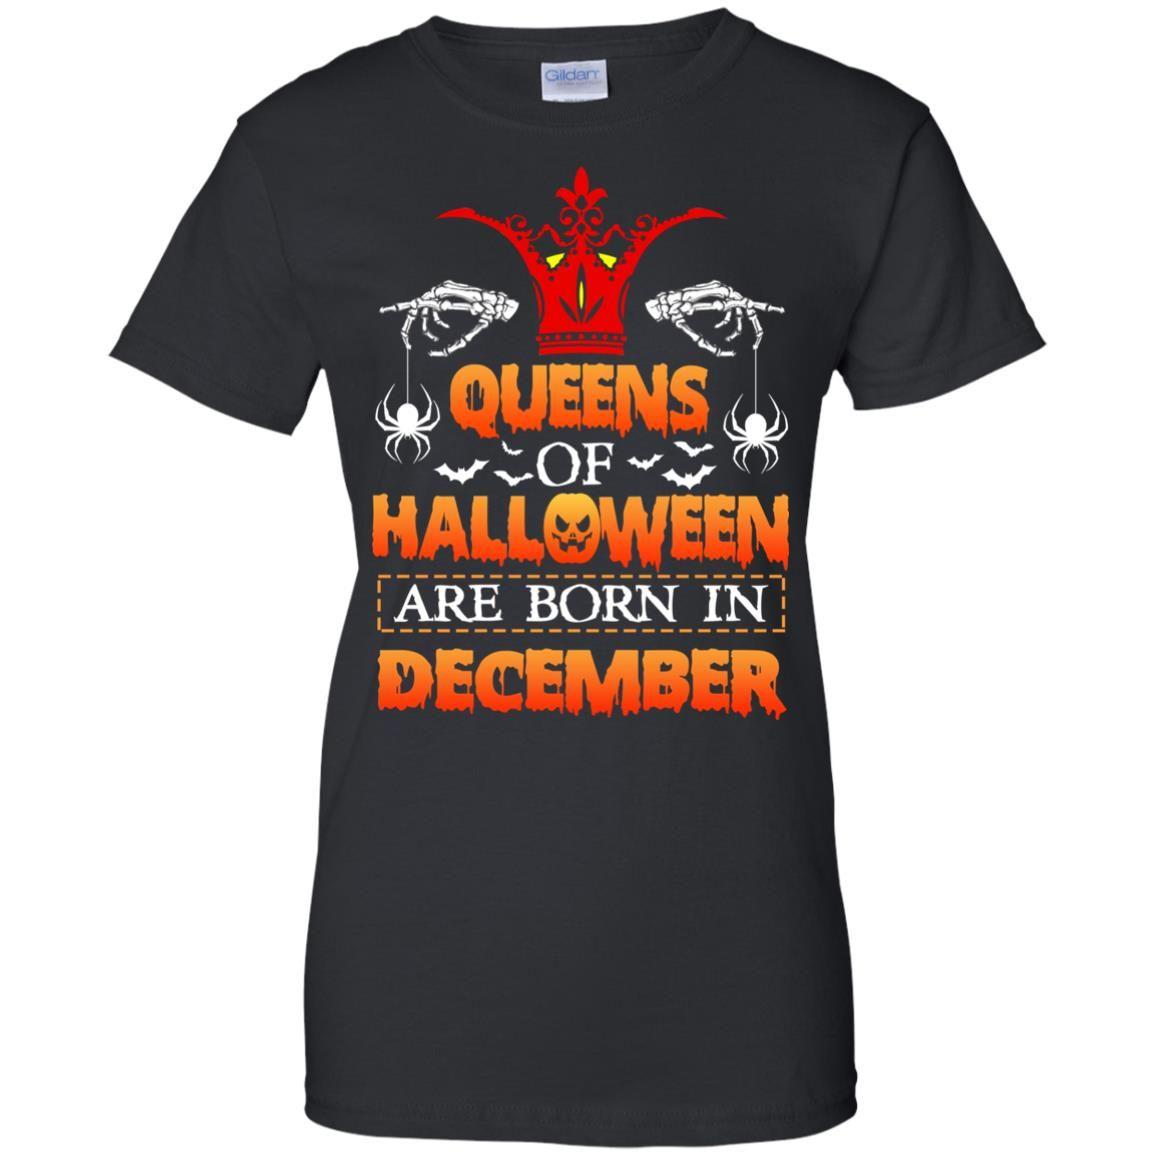 image 970 - Queens of Halloween are born in December shirt, tank top, hoodie